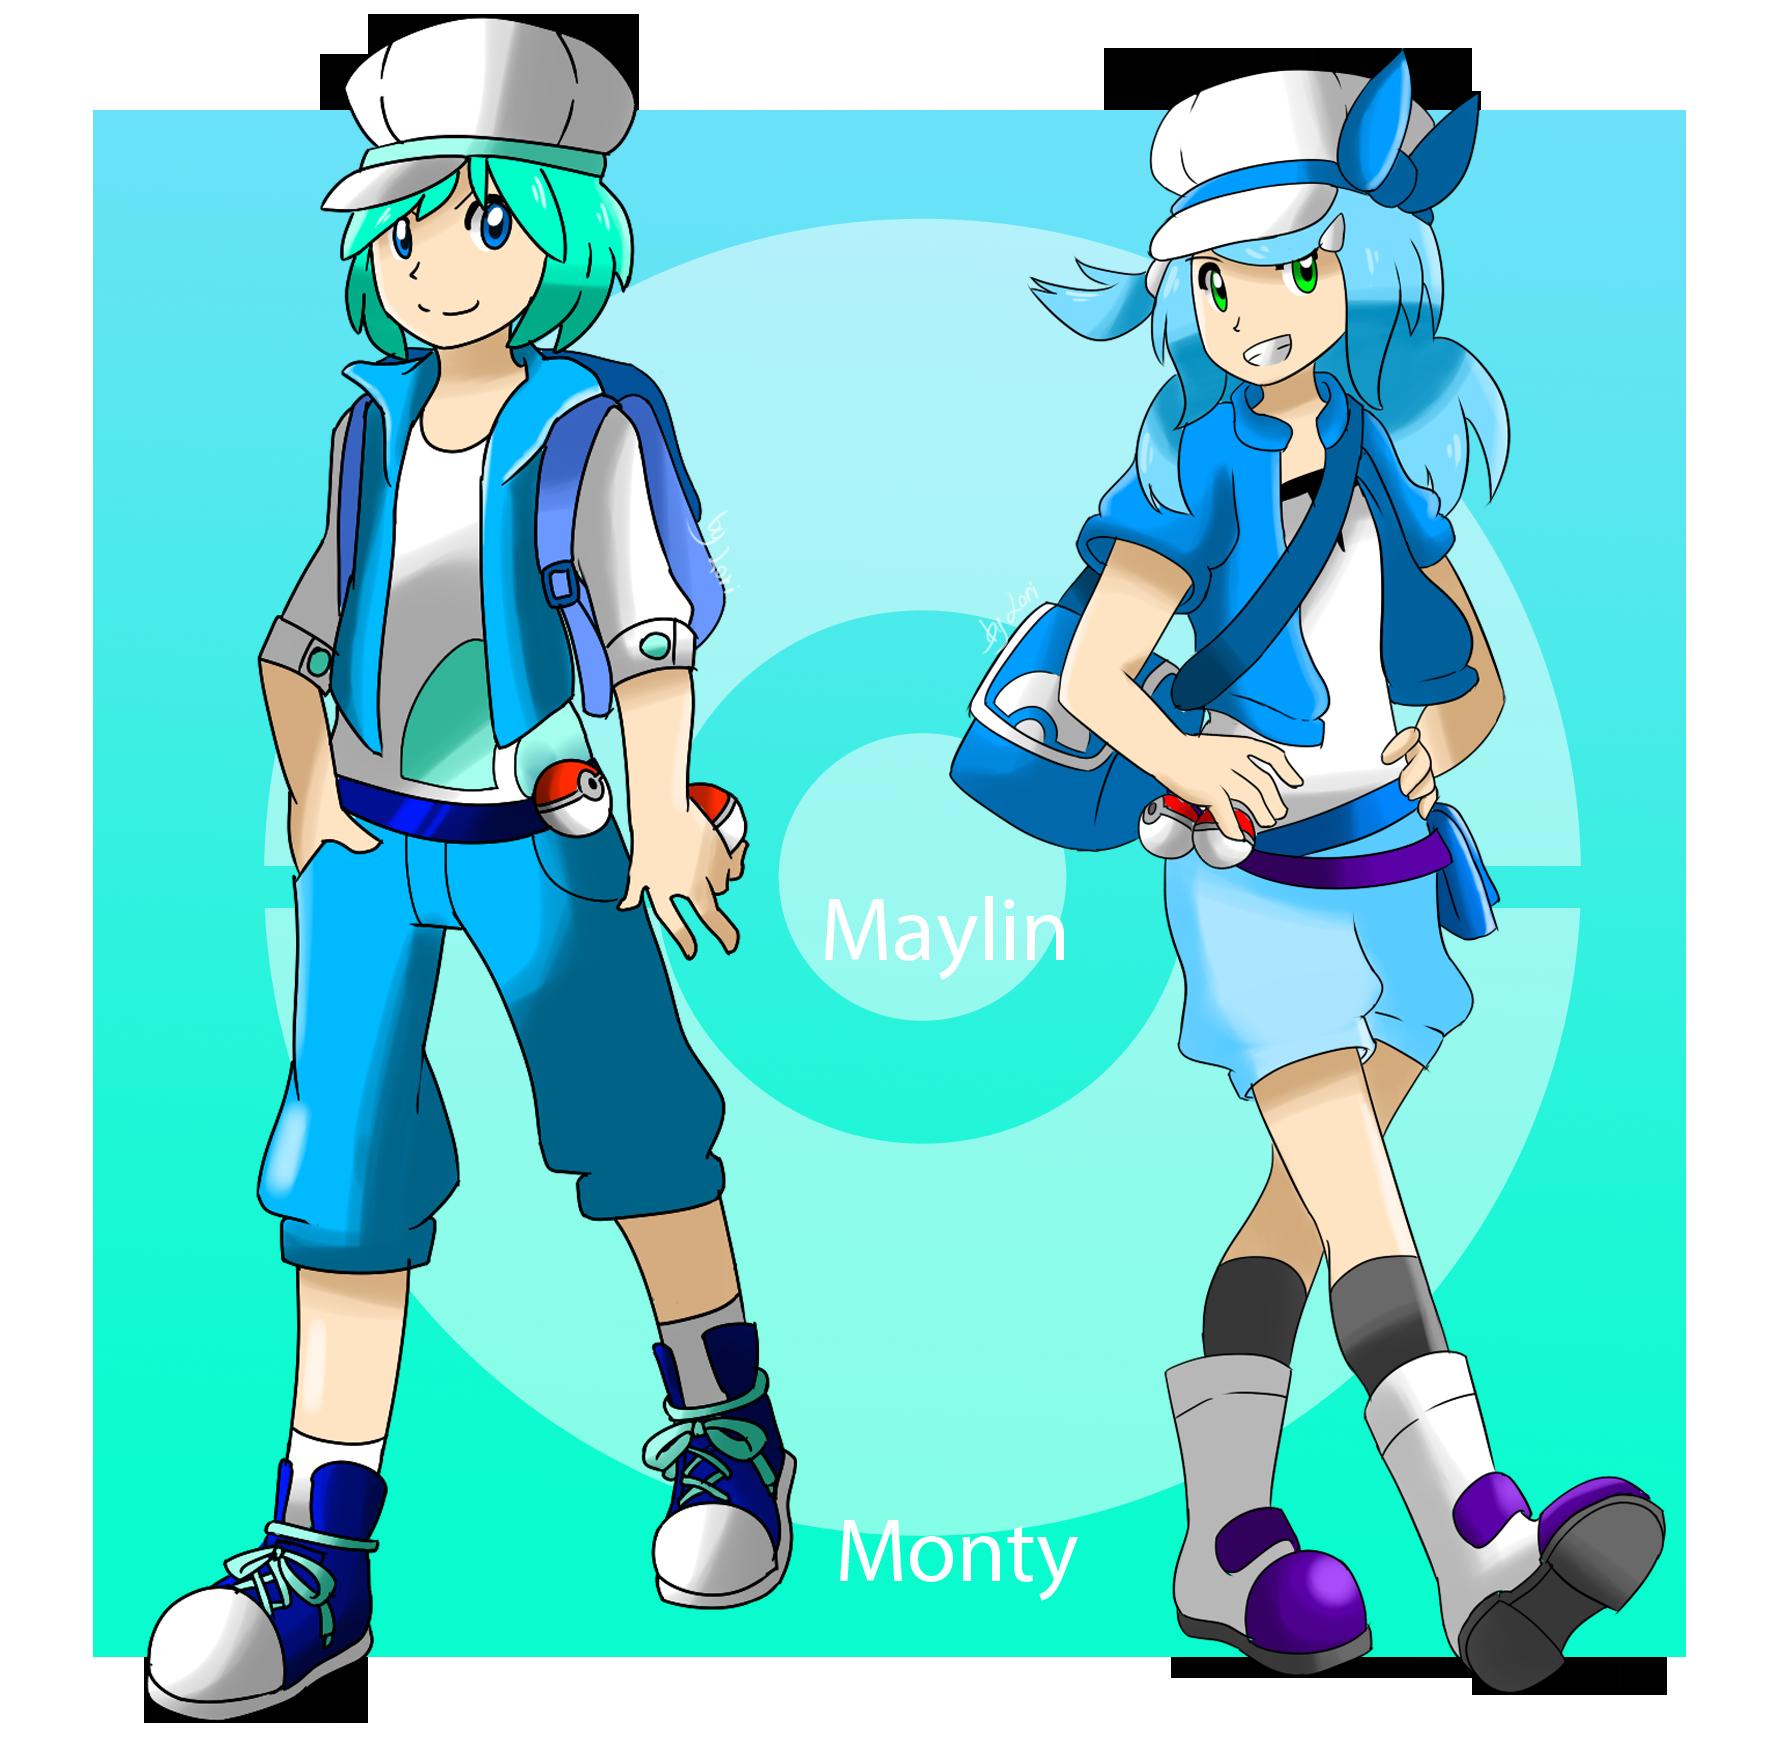 [Criação] NPC's para as Routes do RPG 2.0 Pokemon_trainers__monty_and_maylin_by_cacao_latte-d5uwbqq